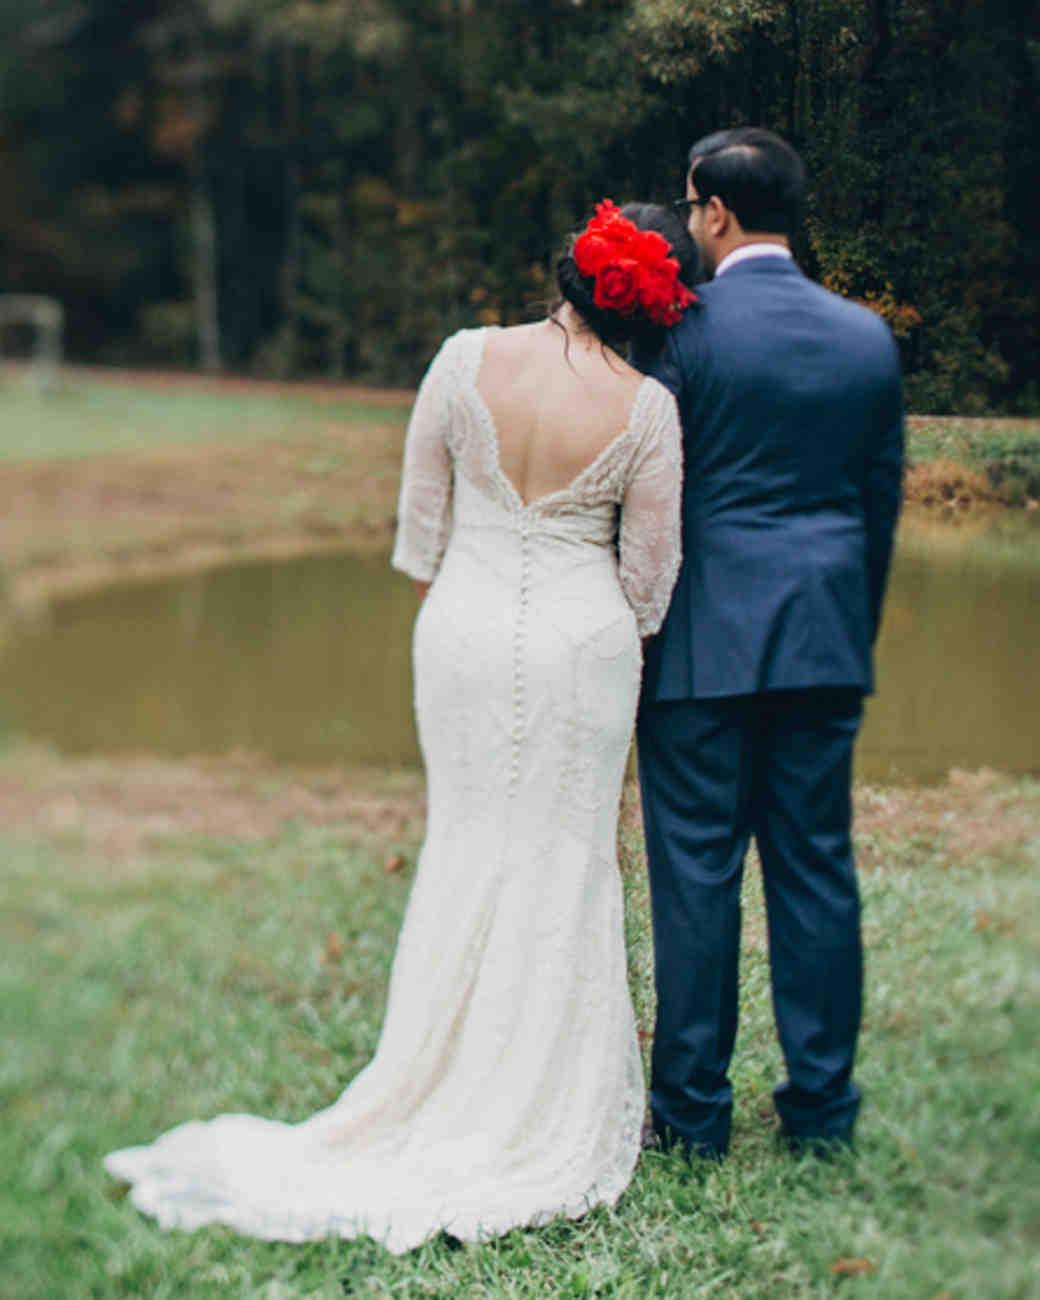 thea-rachit-wedding-couple-0207-s112016-0715.jpg